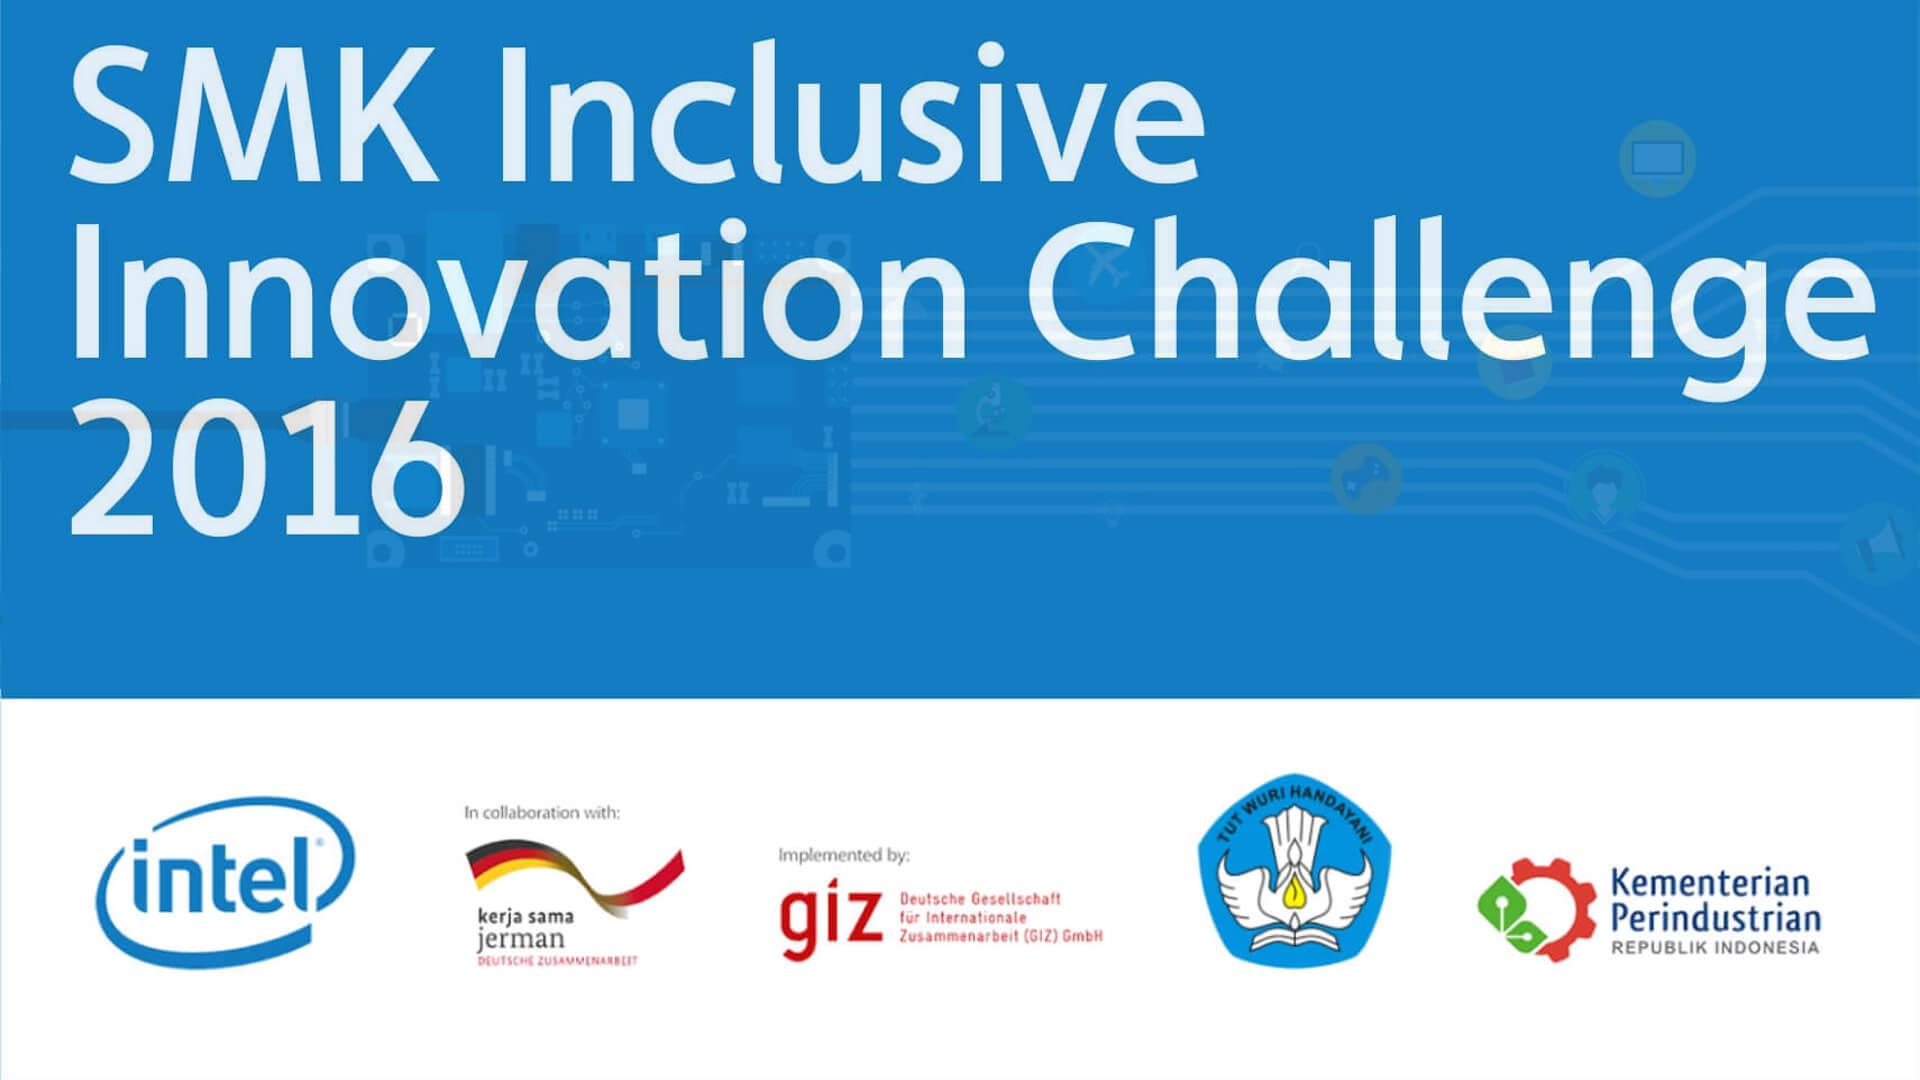 SMK Inclusive Innovation Challenge